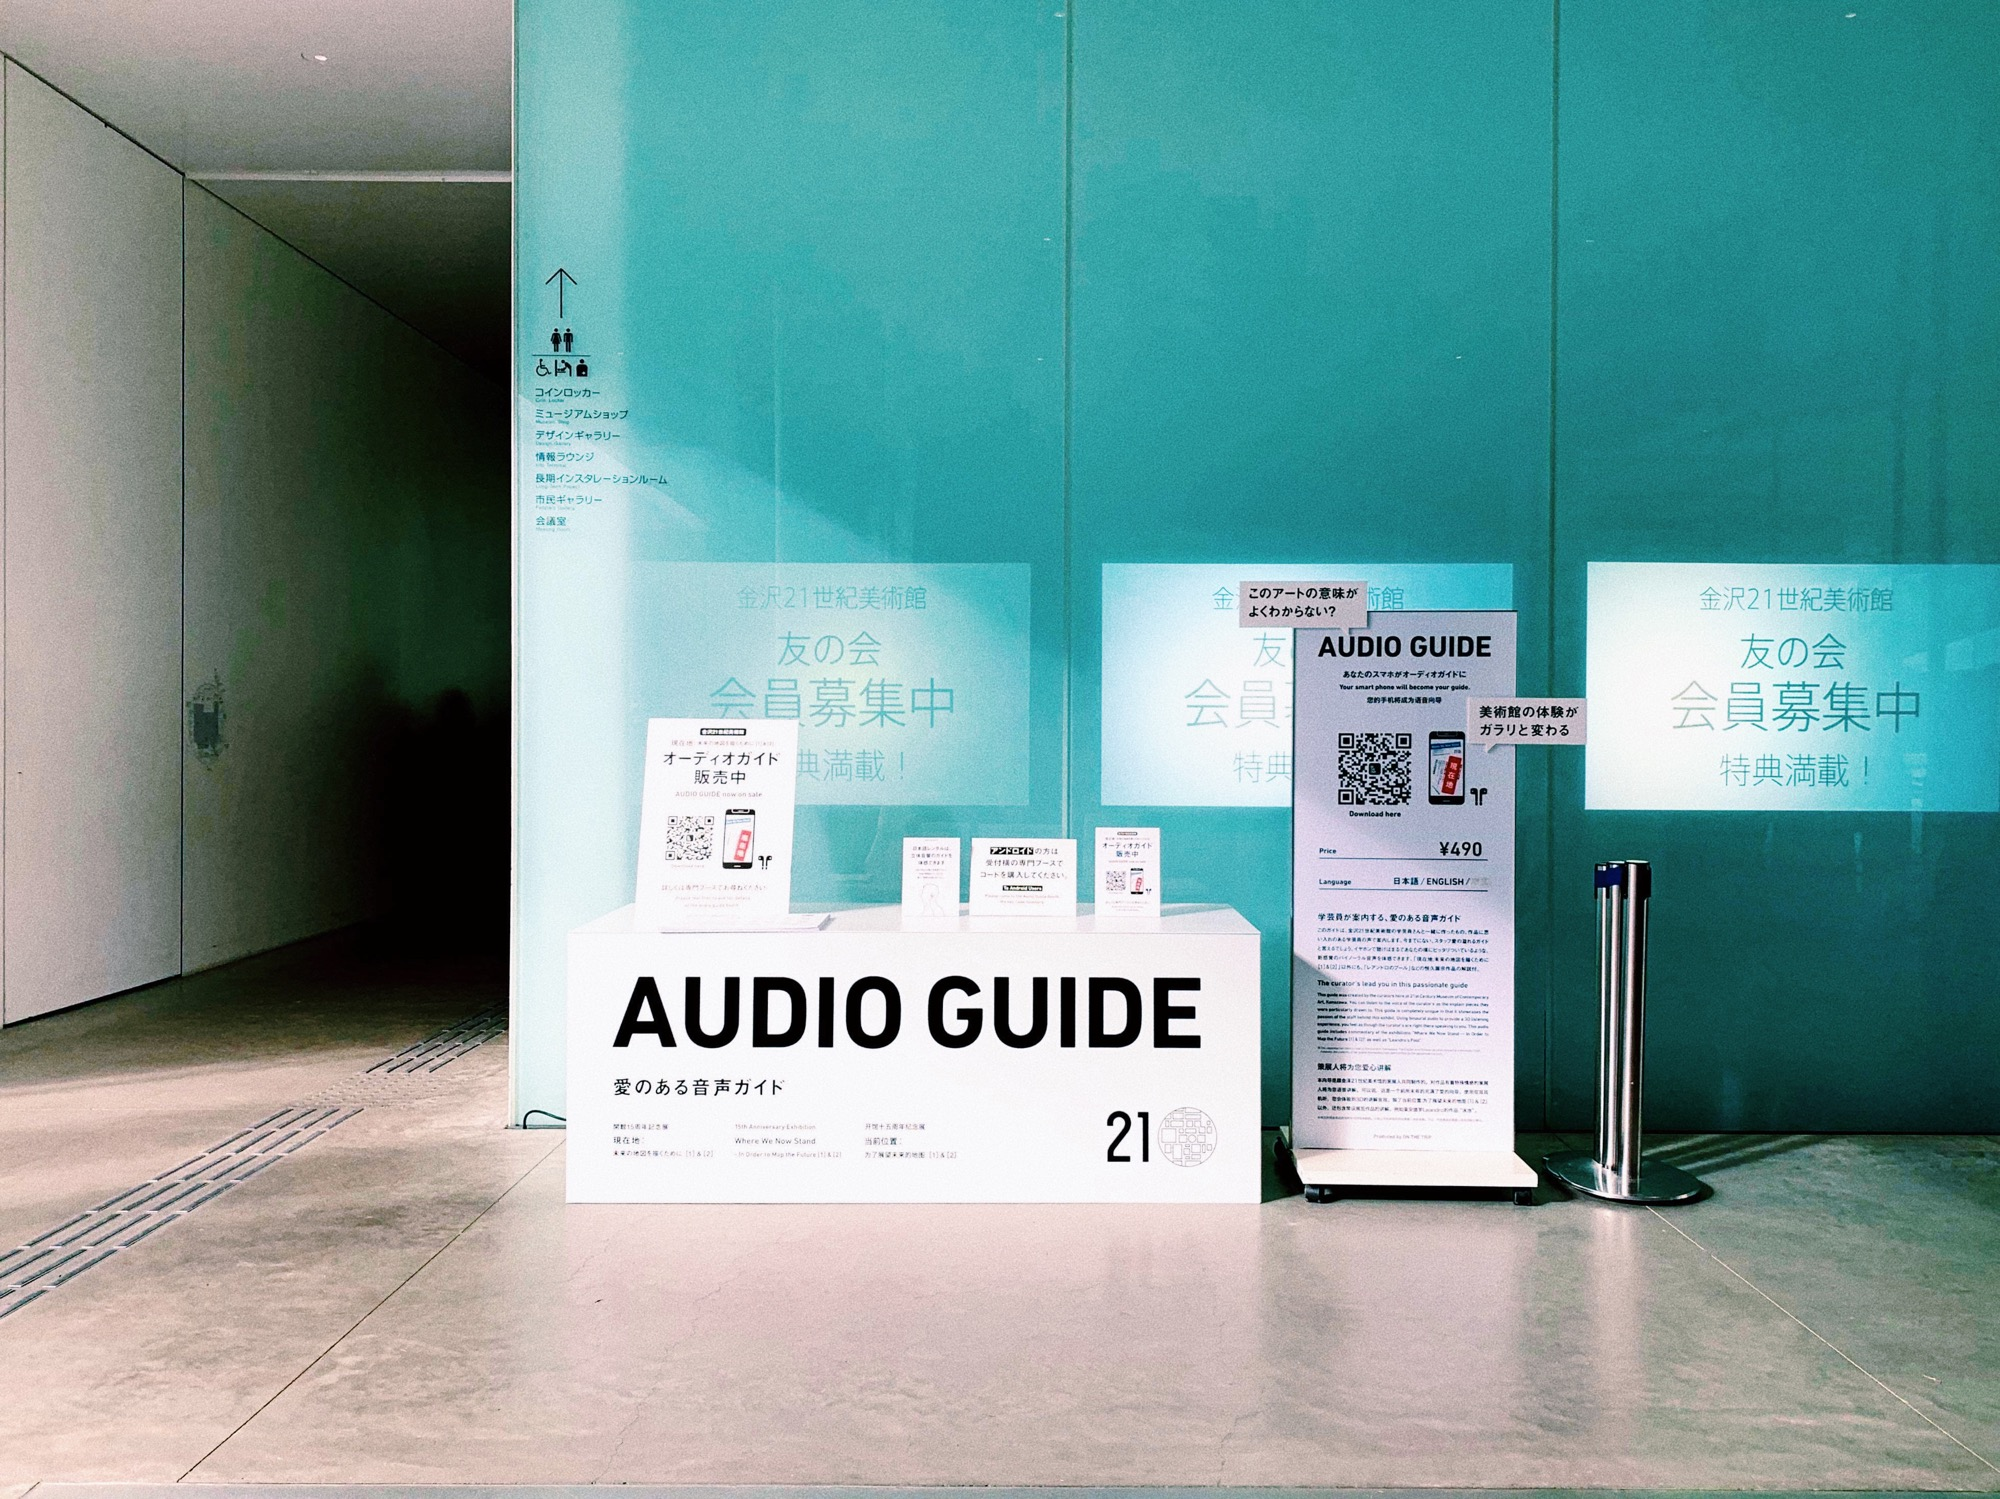 金沢21世紀美術館 公式ガイド